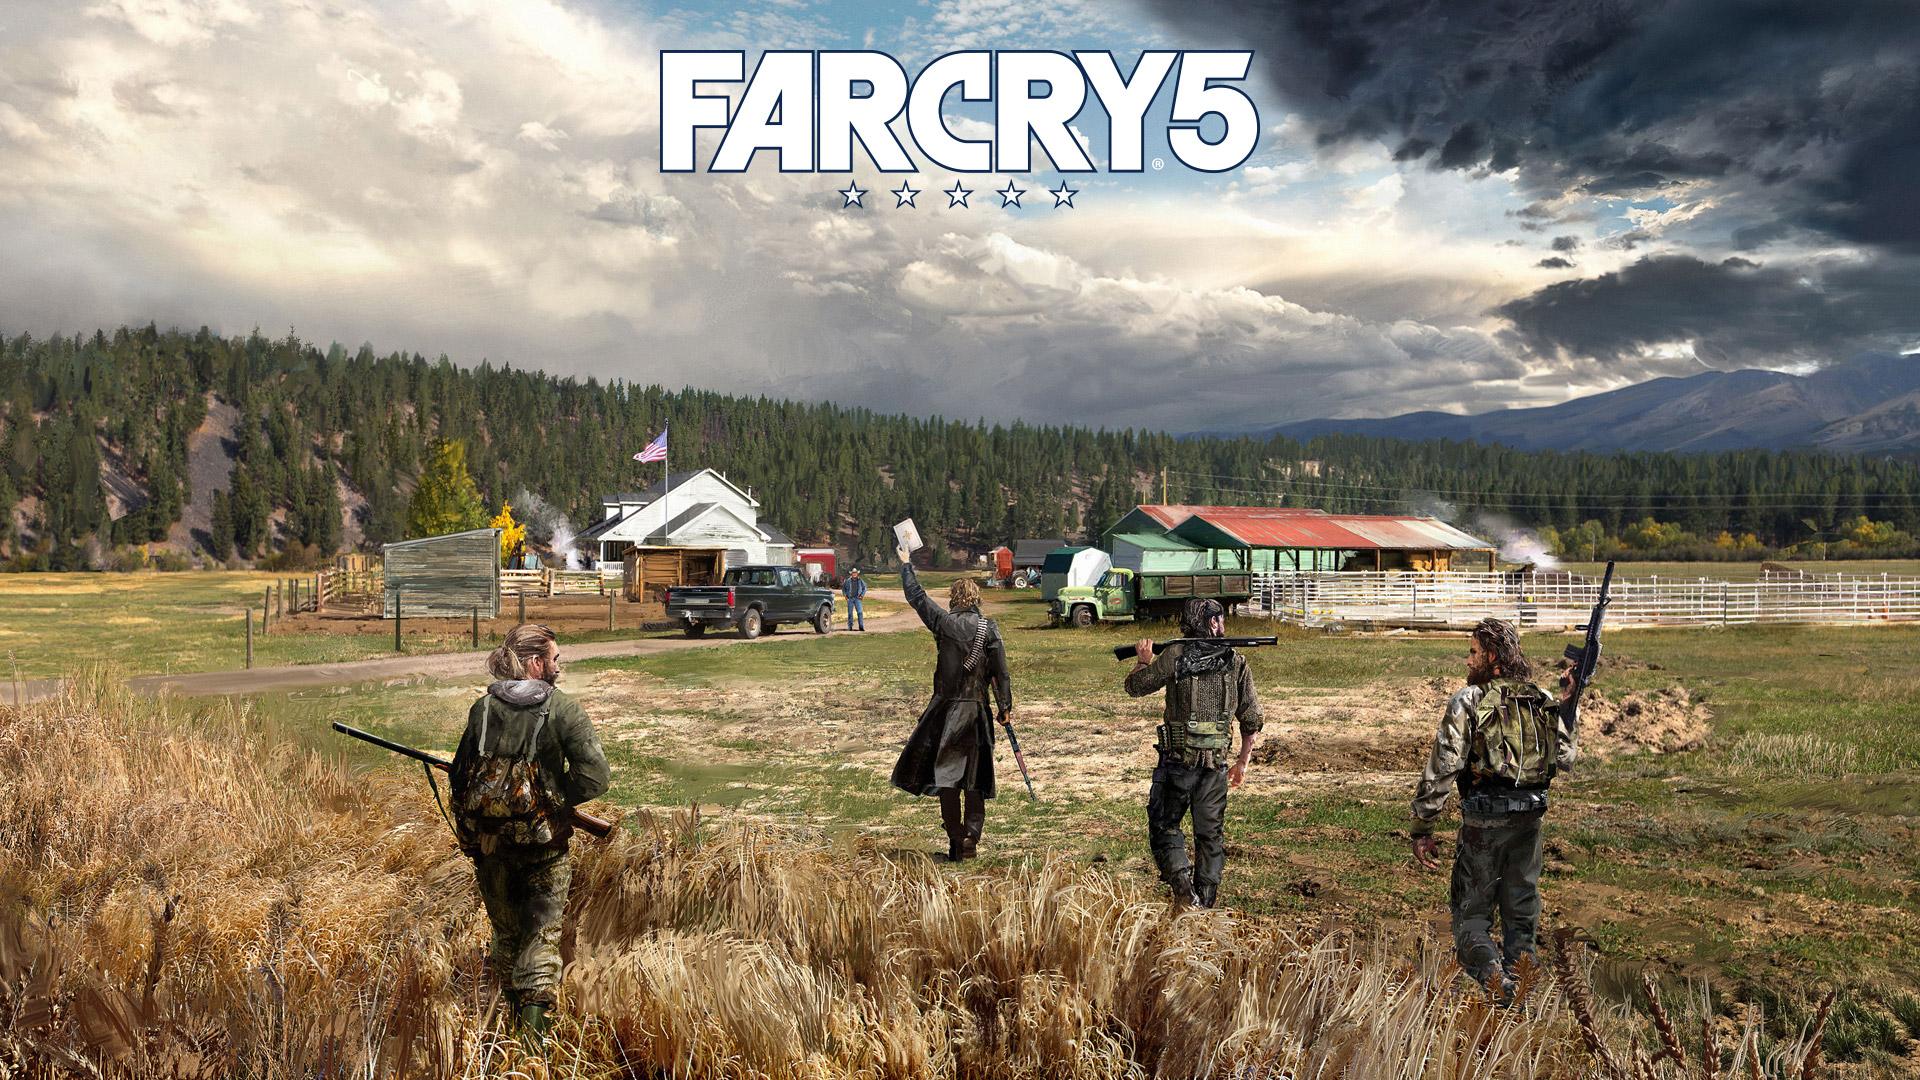 Free Far Cry 5 Wallpaper in 1920x1080